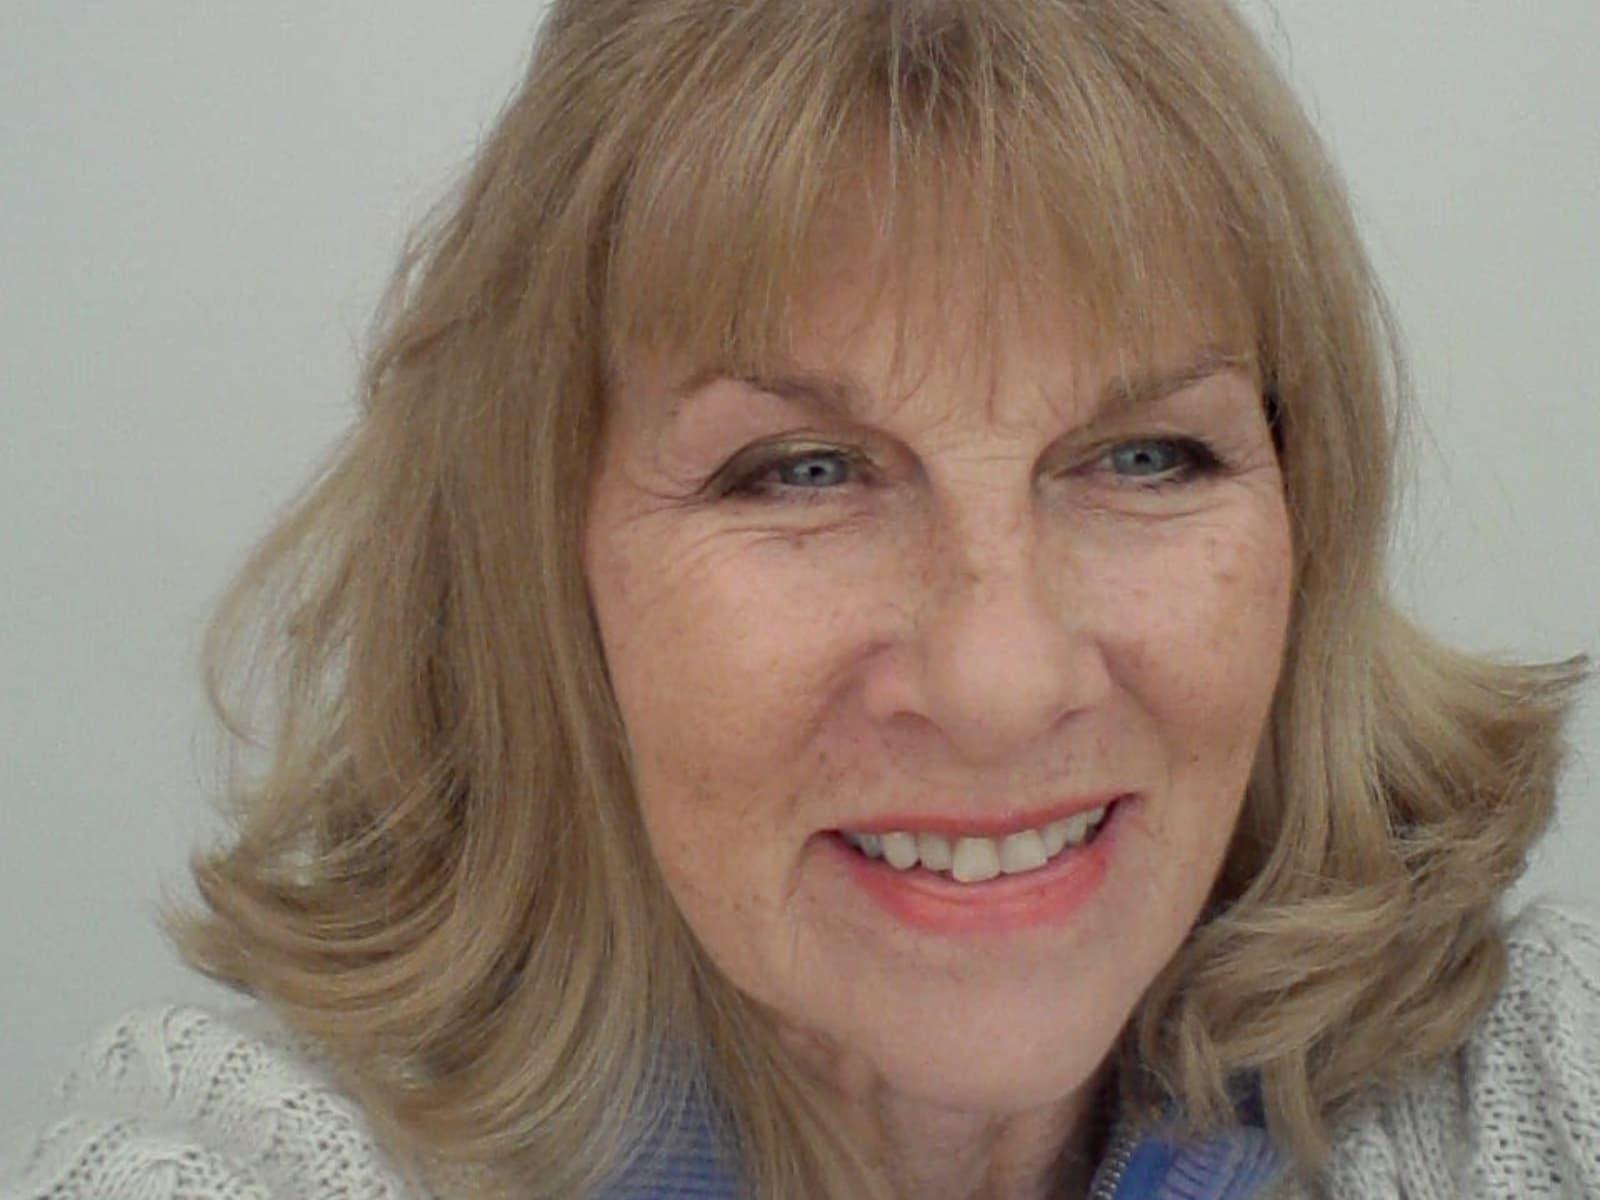 Lynne from Midhurst, United Kingdom